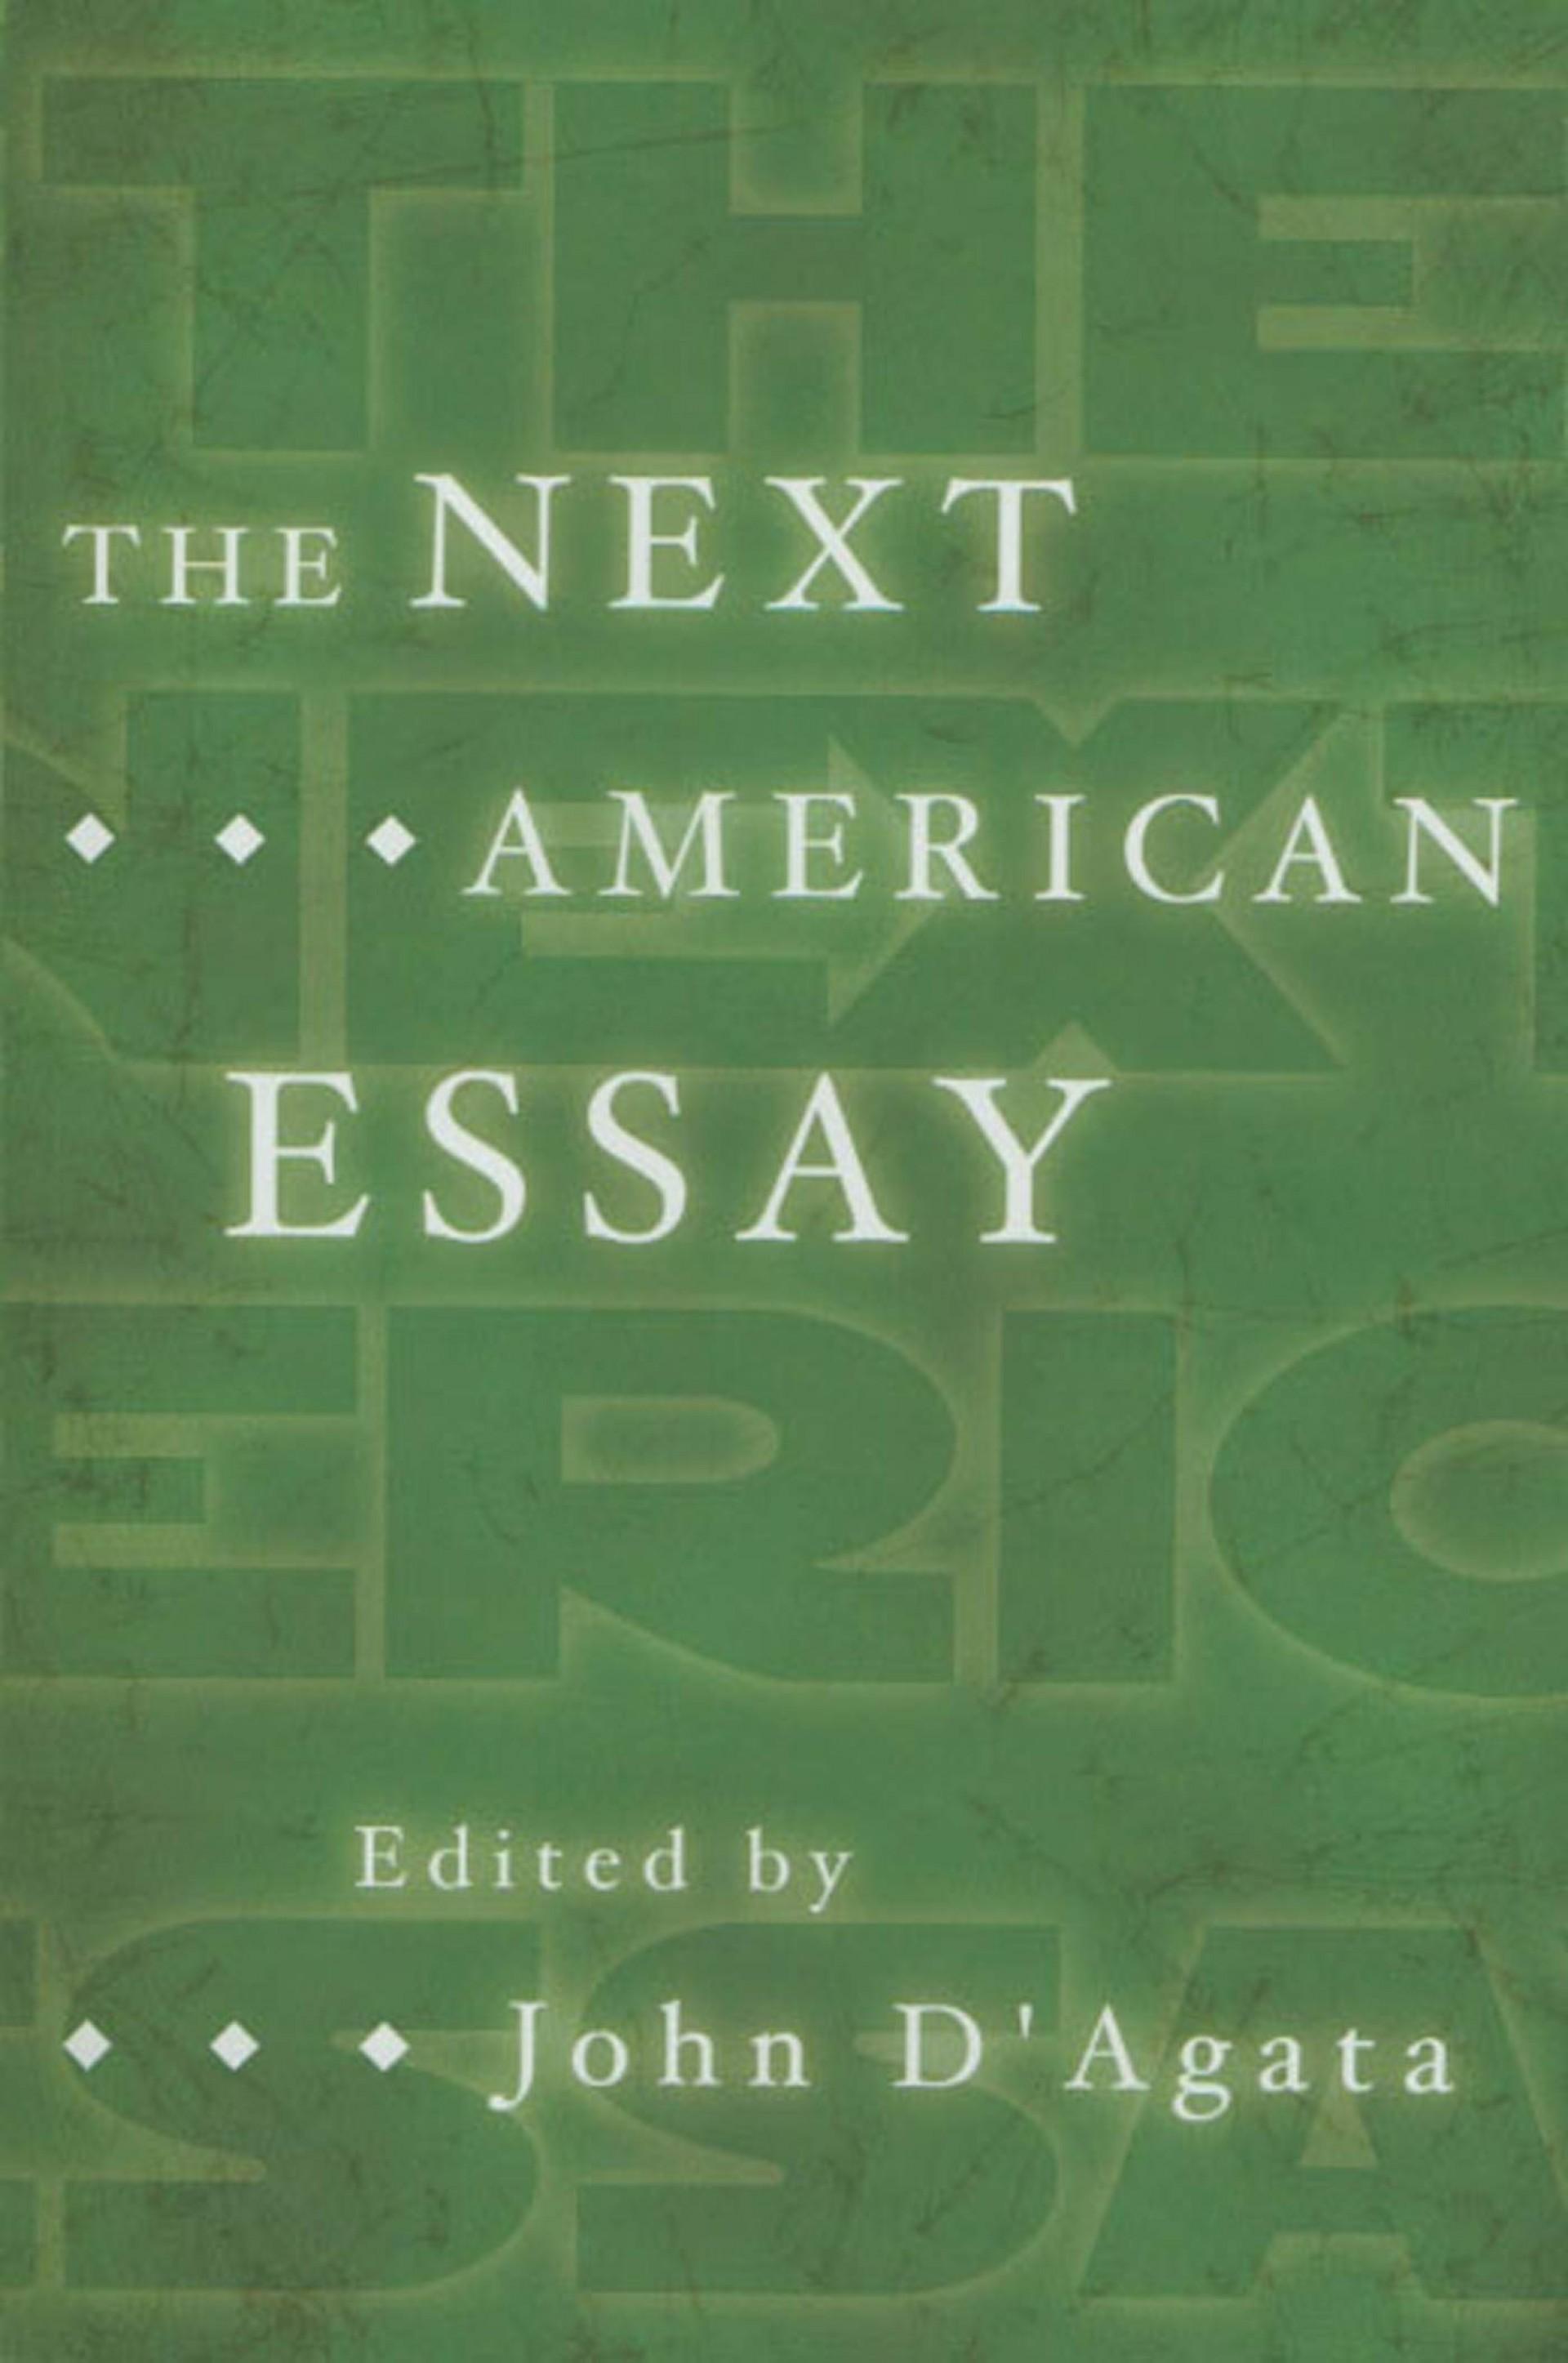 006 John Agata Essay 61uwmdqvqdl Stirring D D'agata Next American 1920